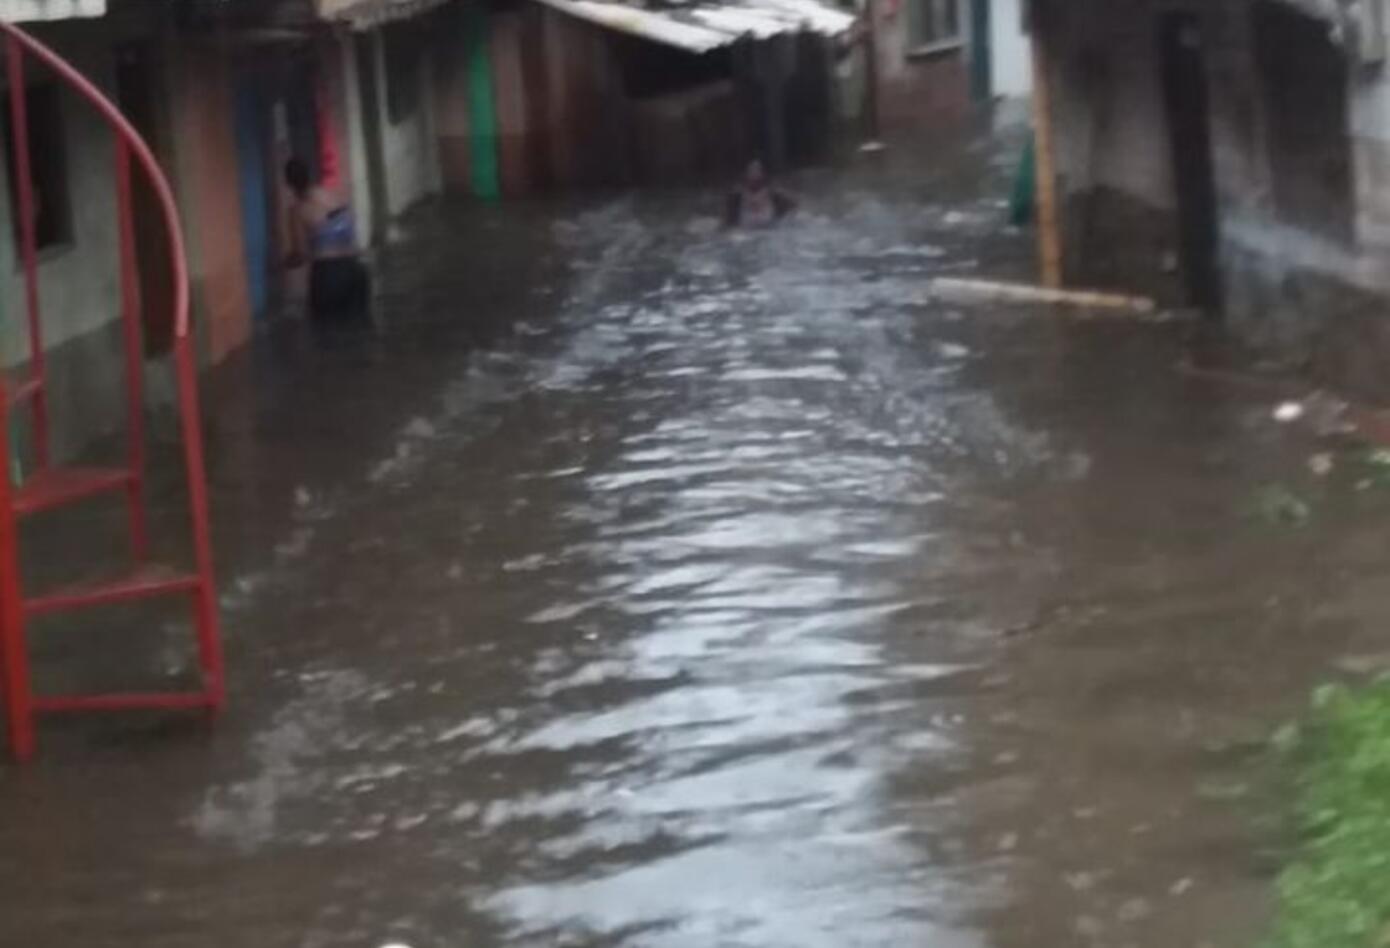 Inundación Bariro Milagro de Dios - Bibiana Marin